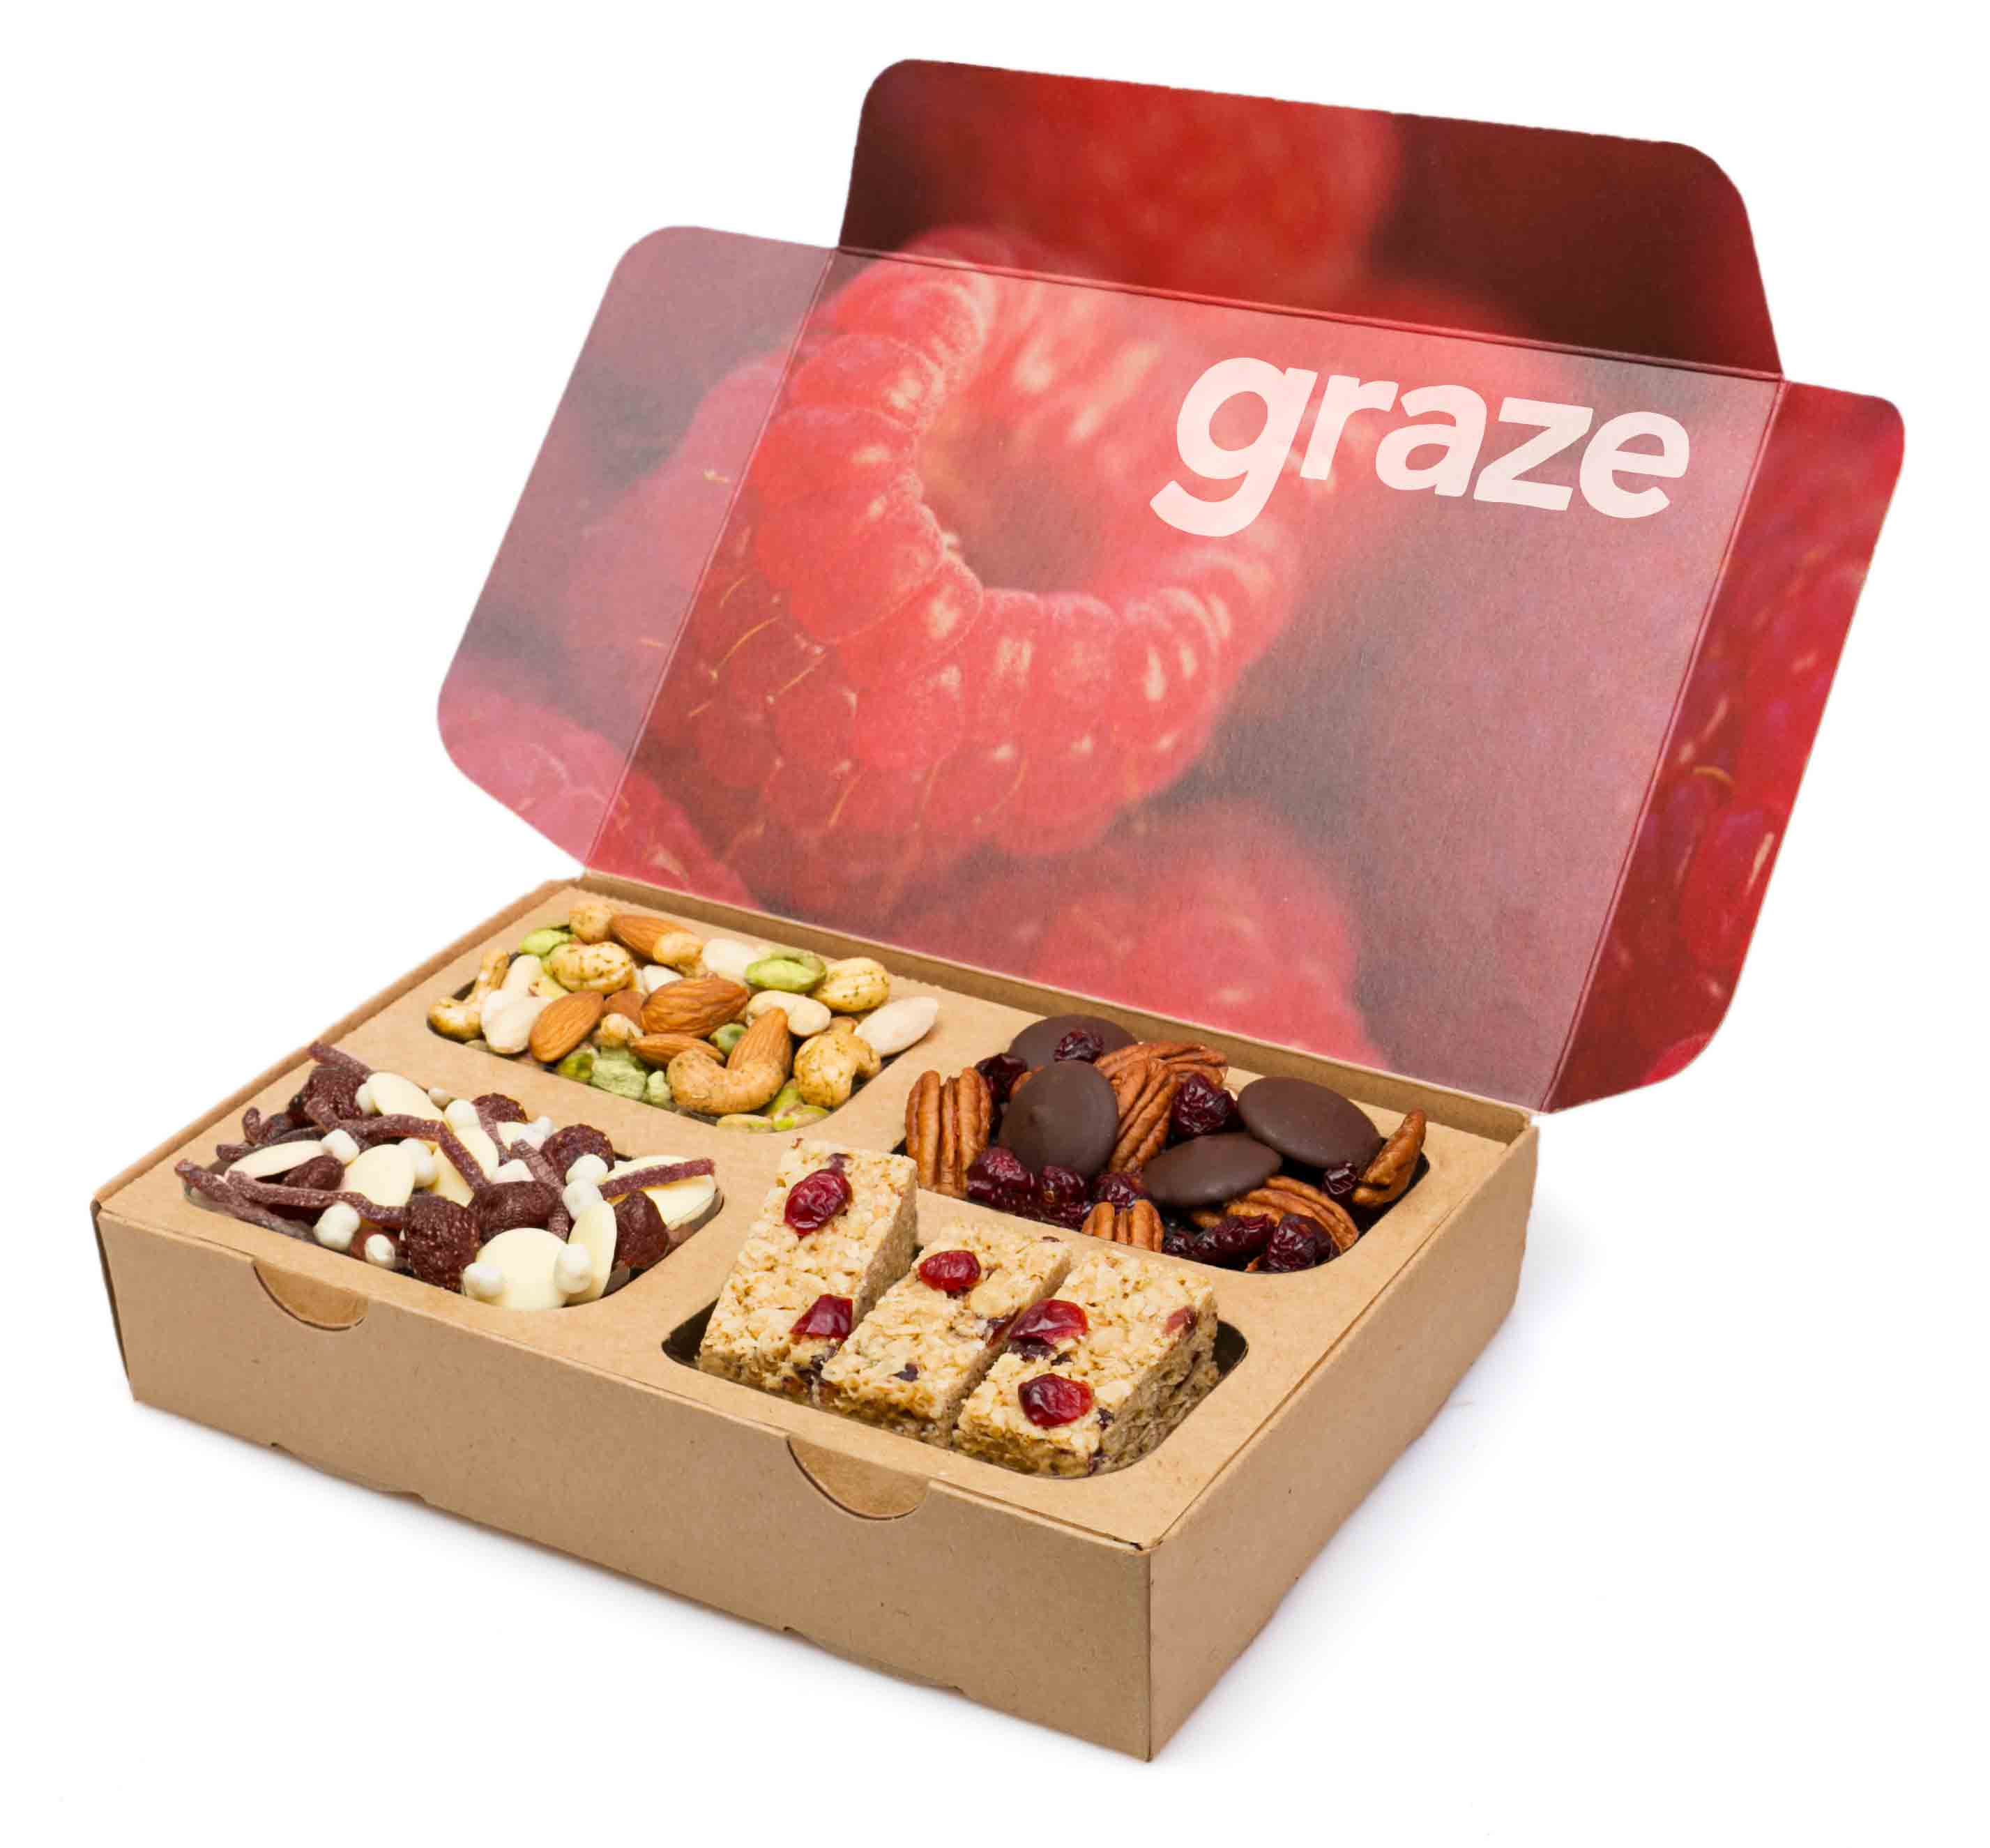 Graze Healthy Subscription Snack Box